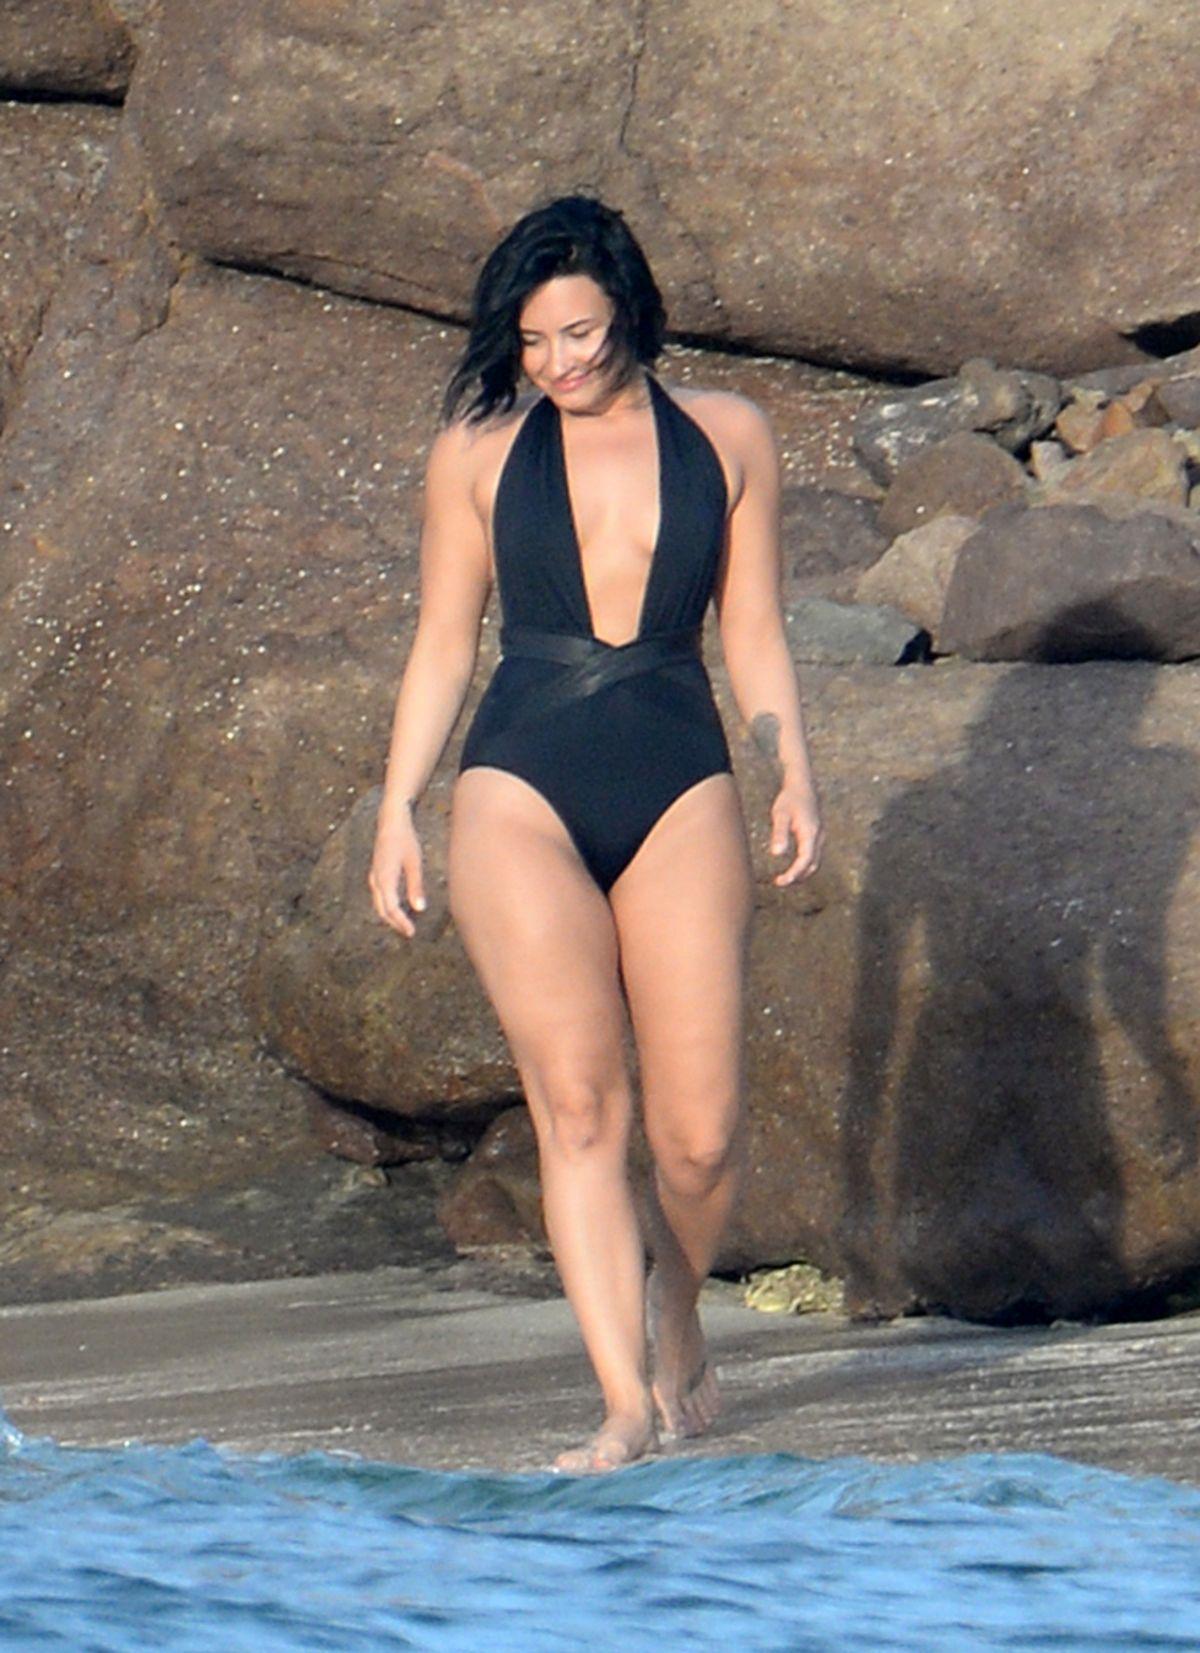 Bikini Demi Lovato naked (78 photo), Pussy, Leaked, Selfie, in bikini 2018